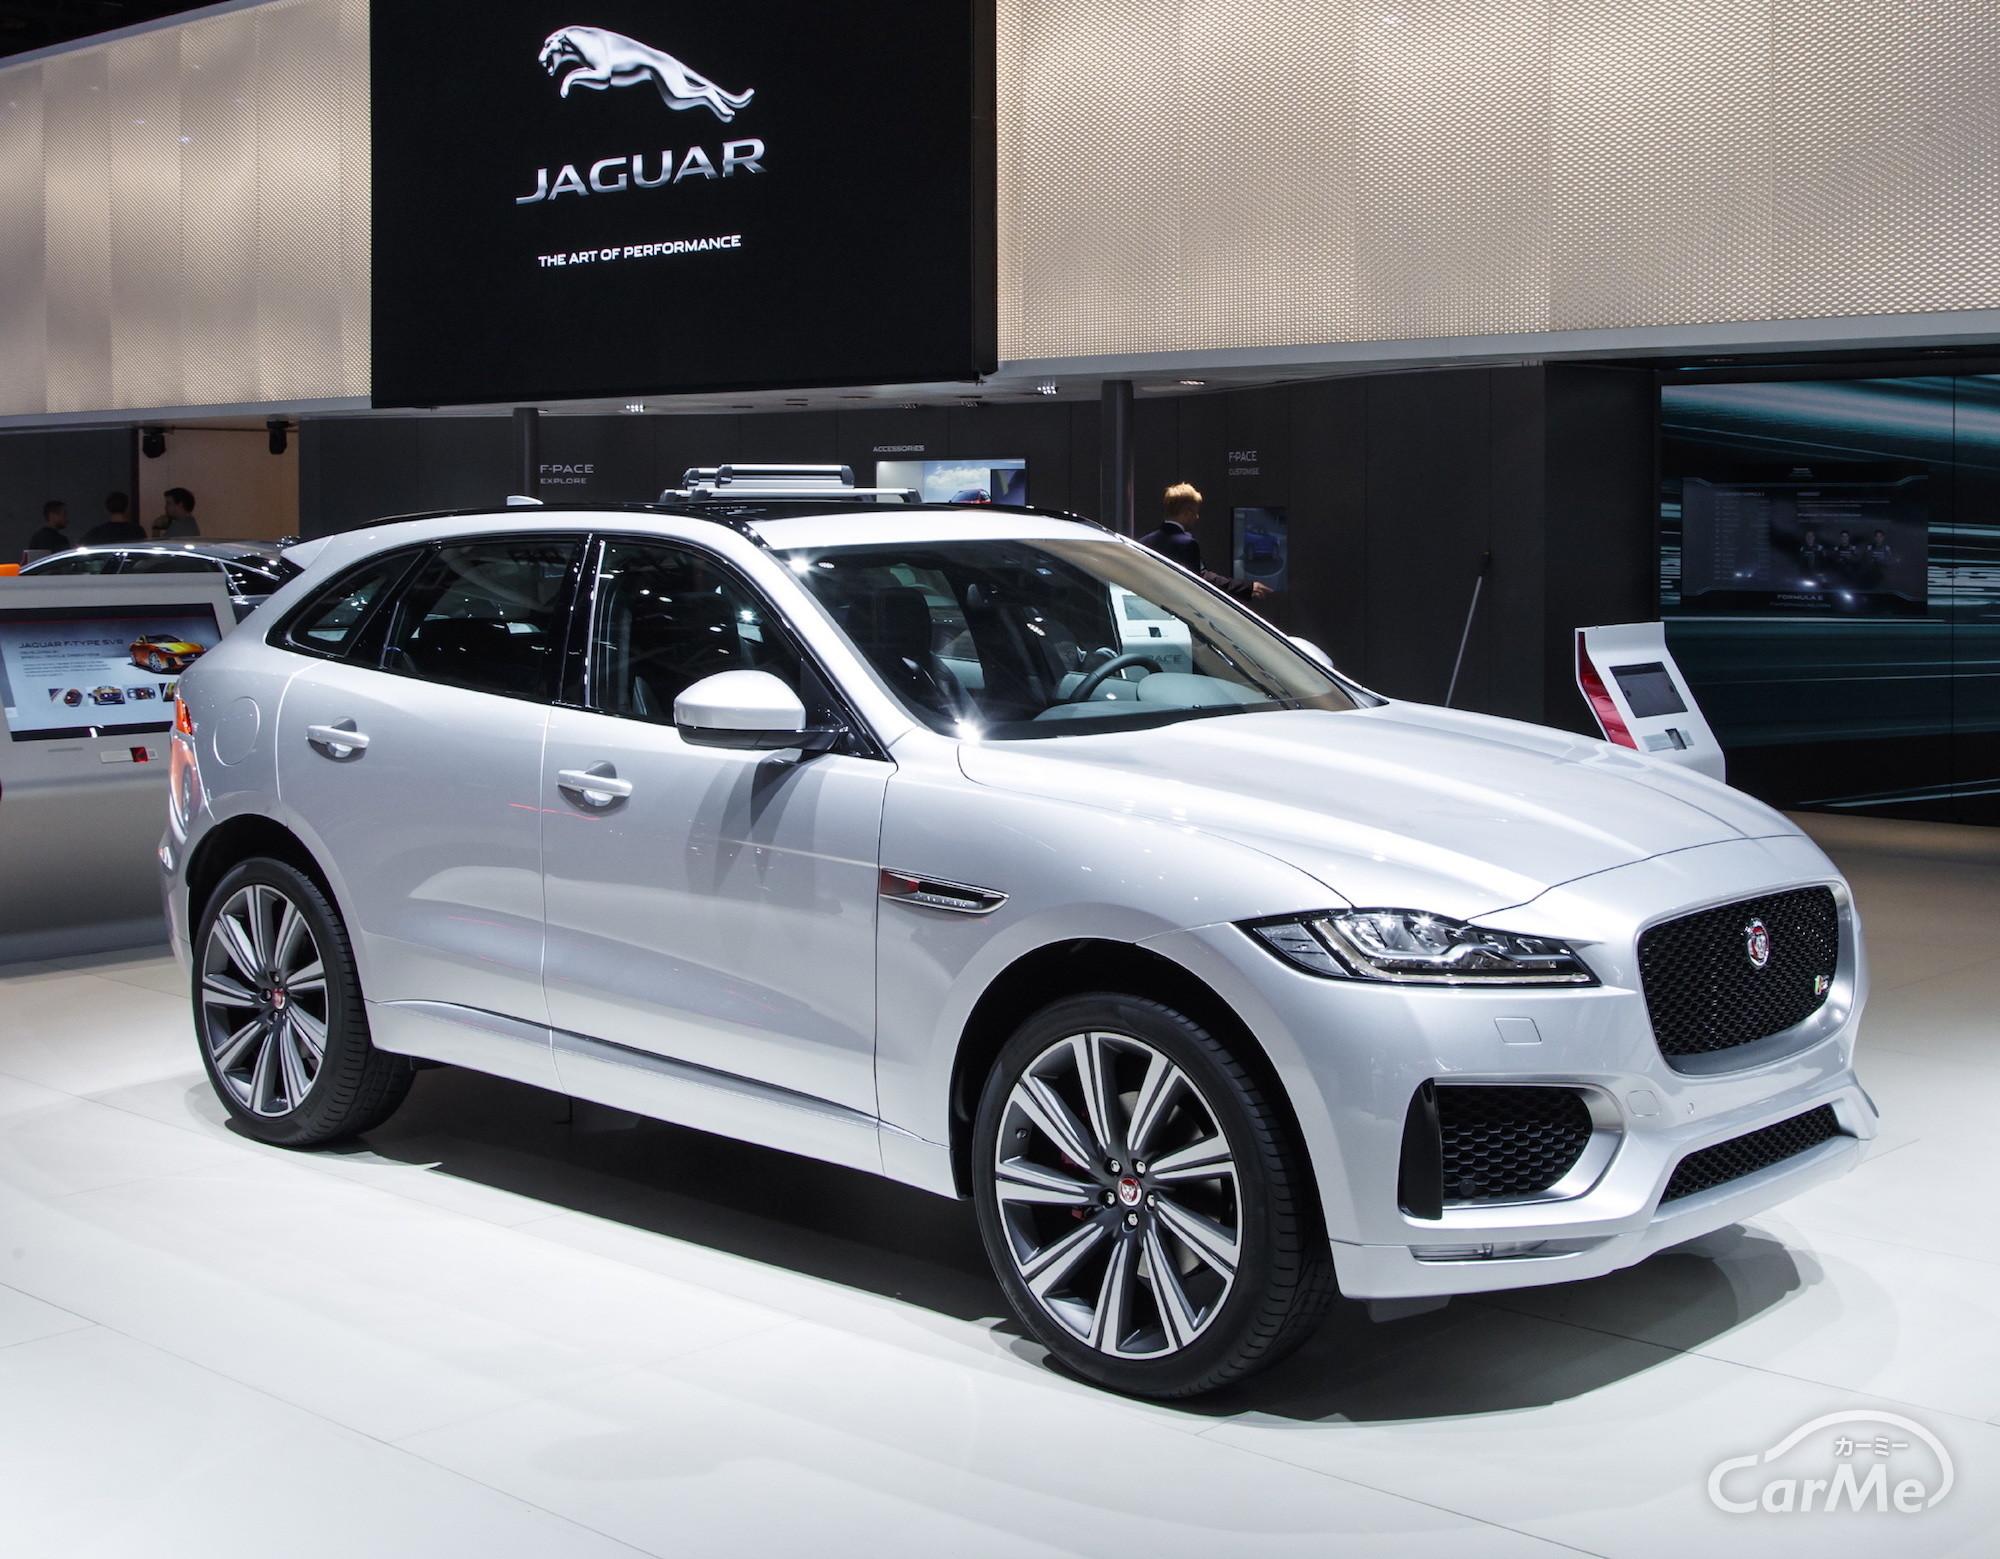 Jaguar Suv F Pace >> ジャガー初の新型SUV「F-PACE」とはどんな車?